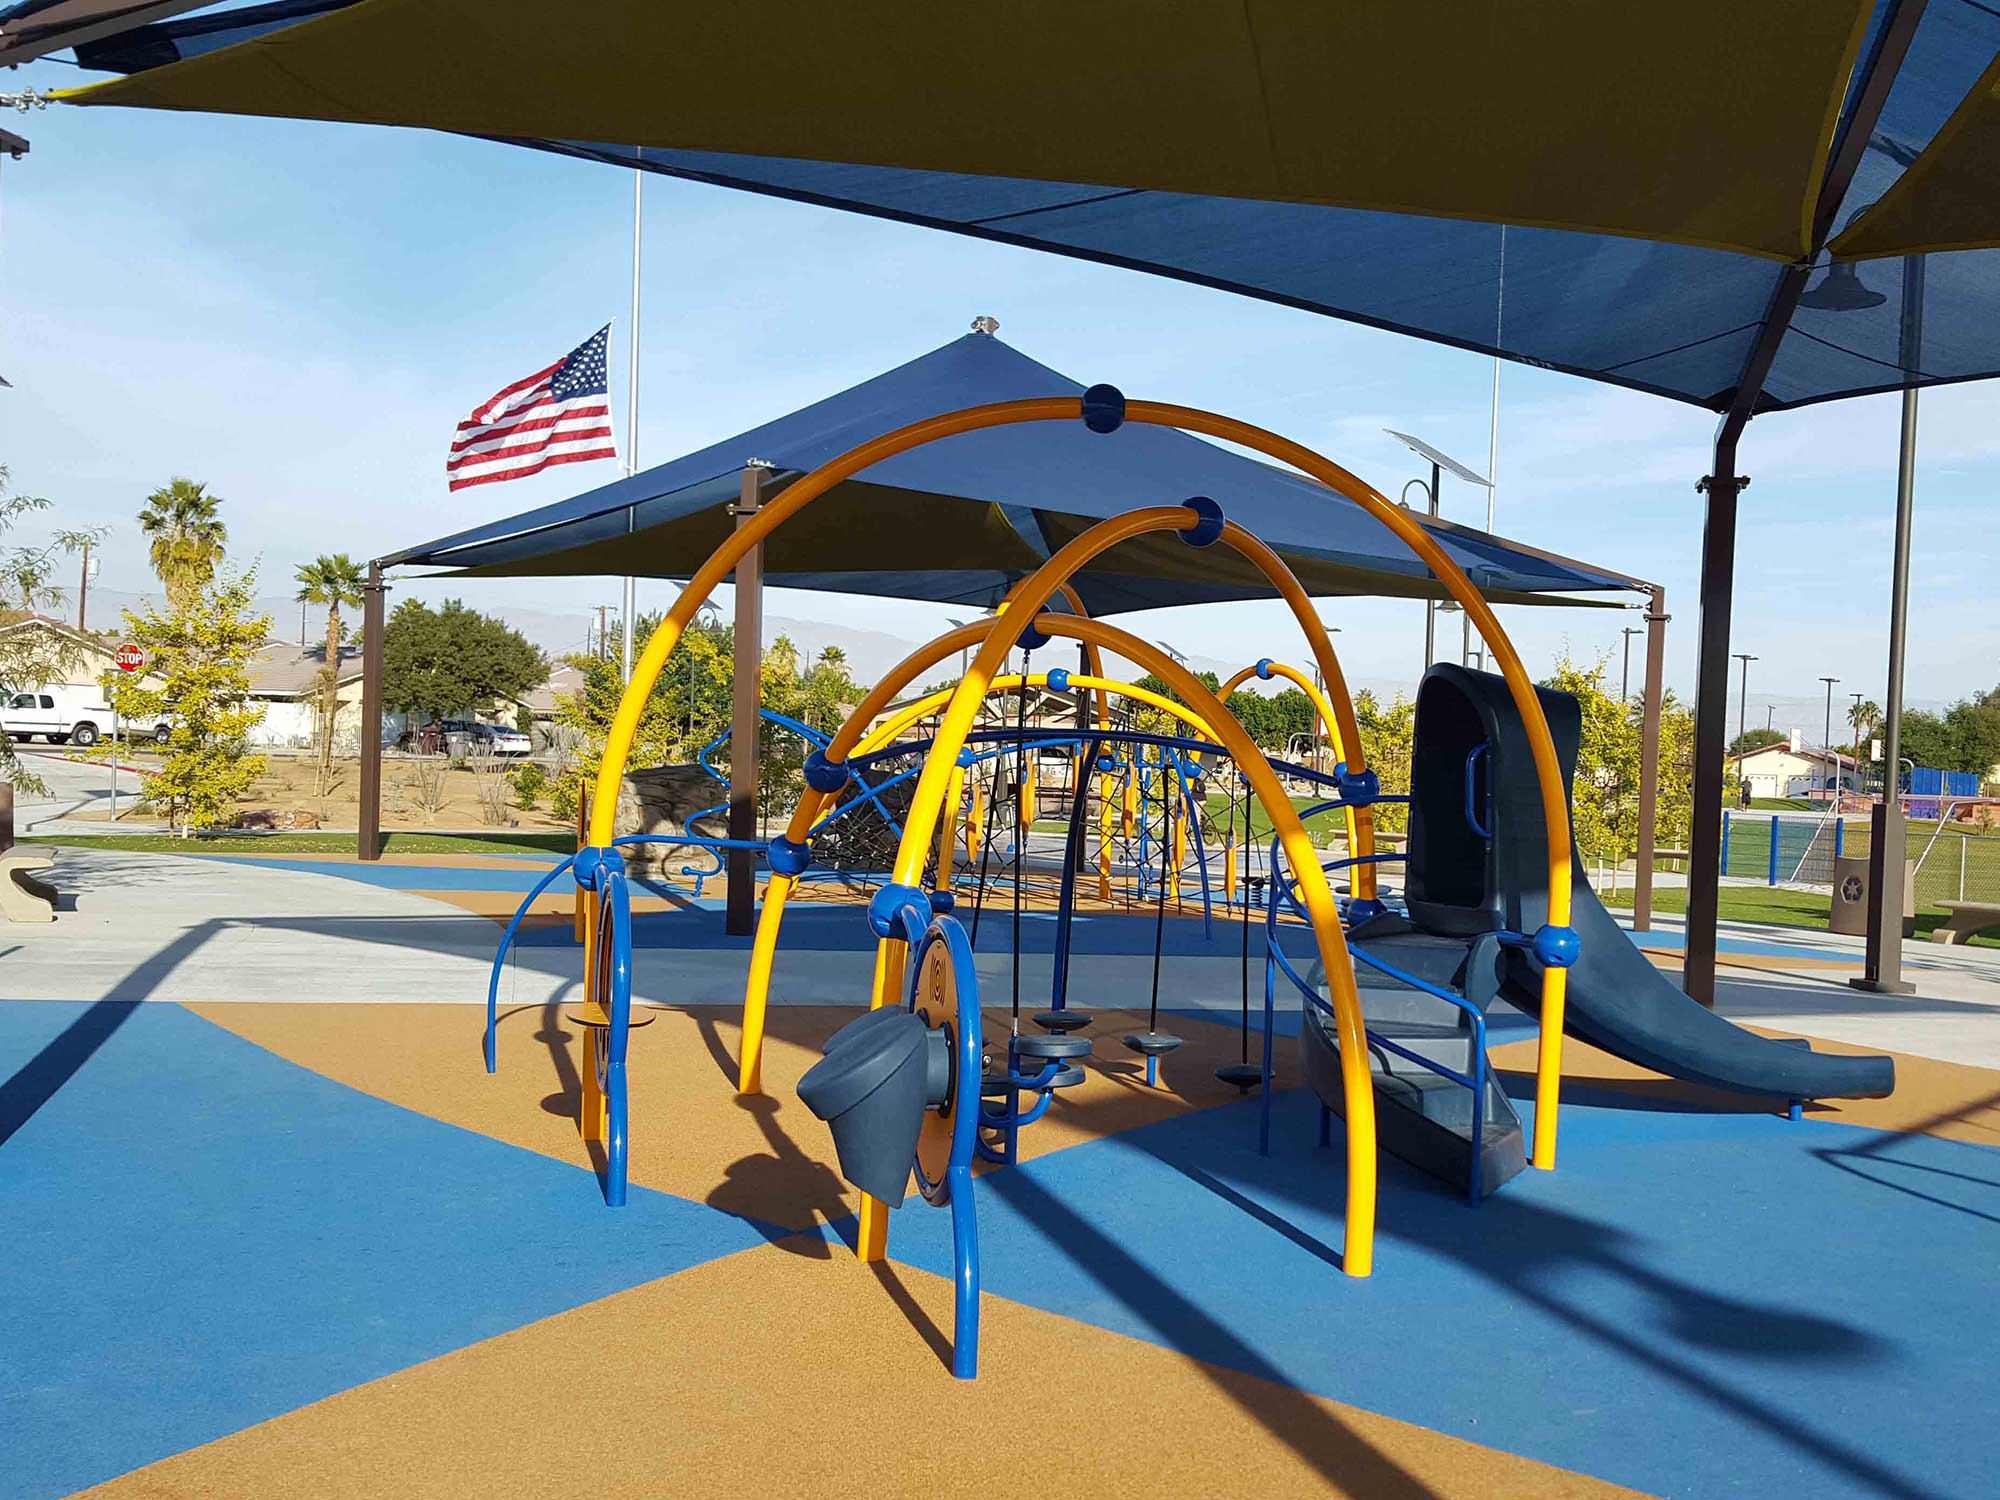 Ocotillo Play Area